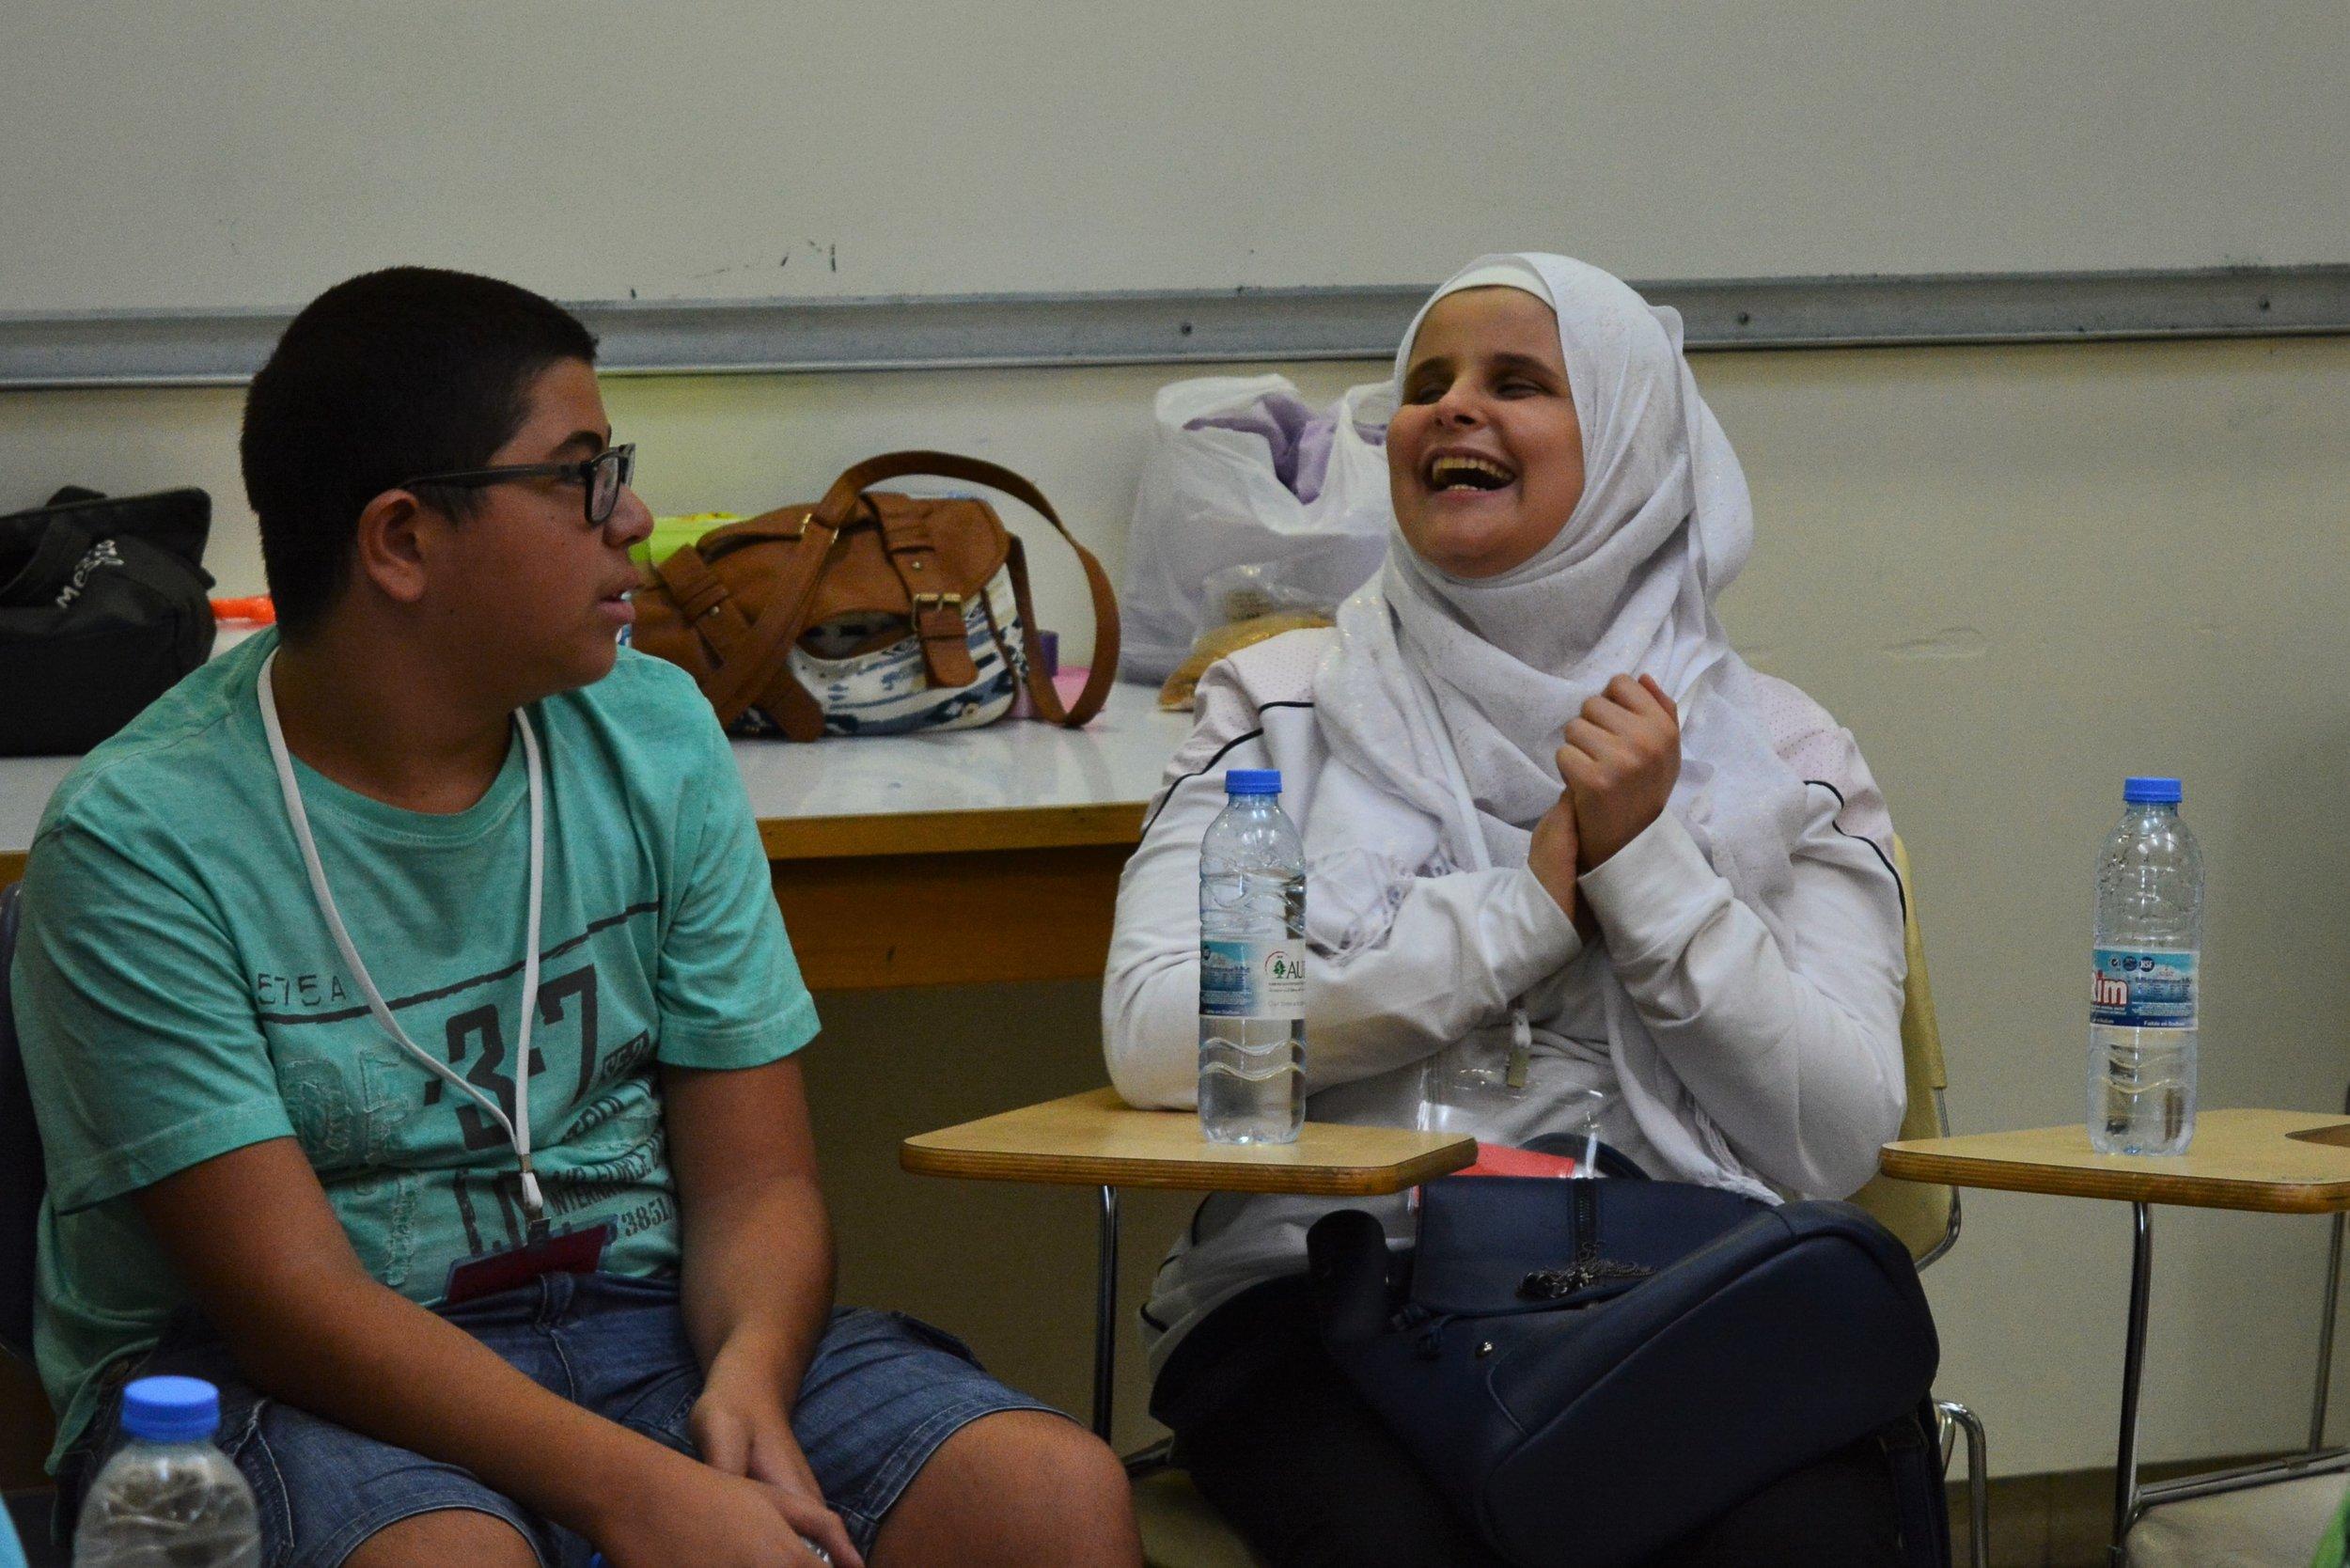 In the picture: a female participant (right) laughs alongside a male participant (left).